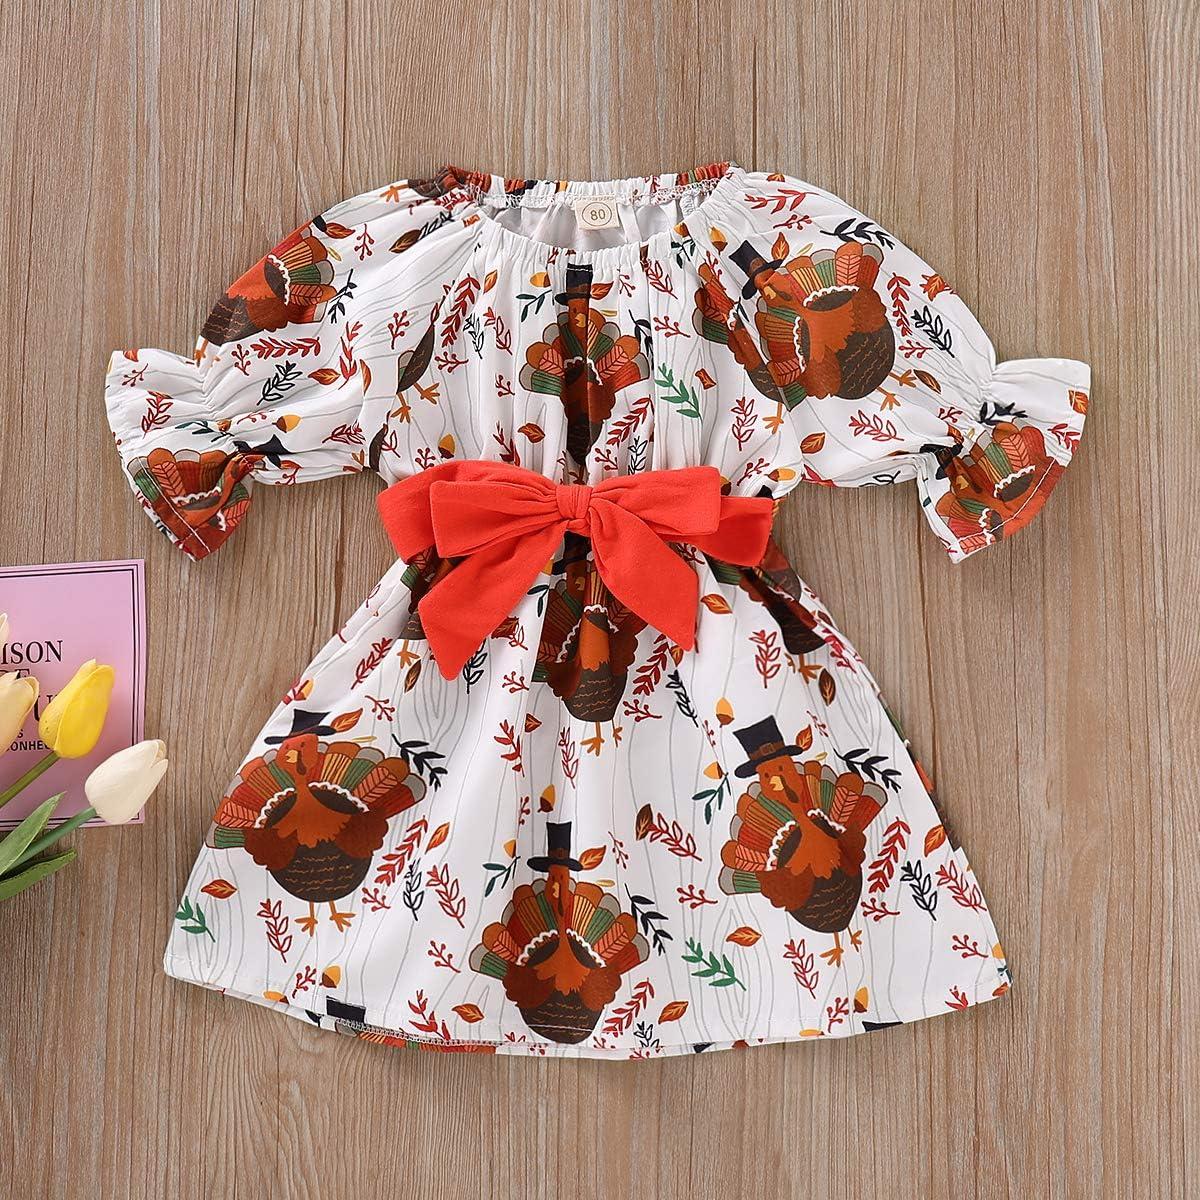 ZOELNIC Baby Girls Christmas Dress Long Sleeve Deer Bowknot Ruffles Tutu Dress